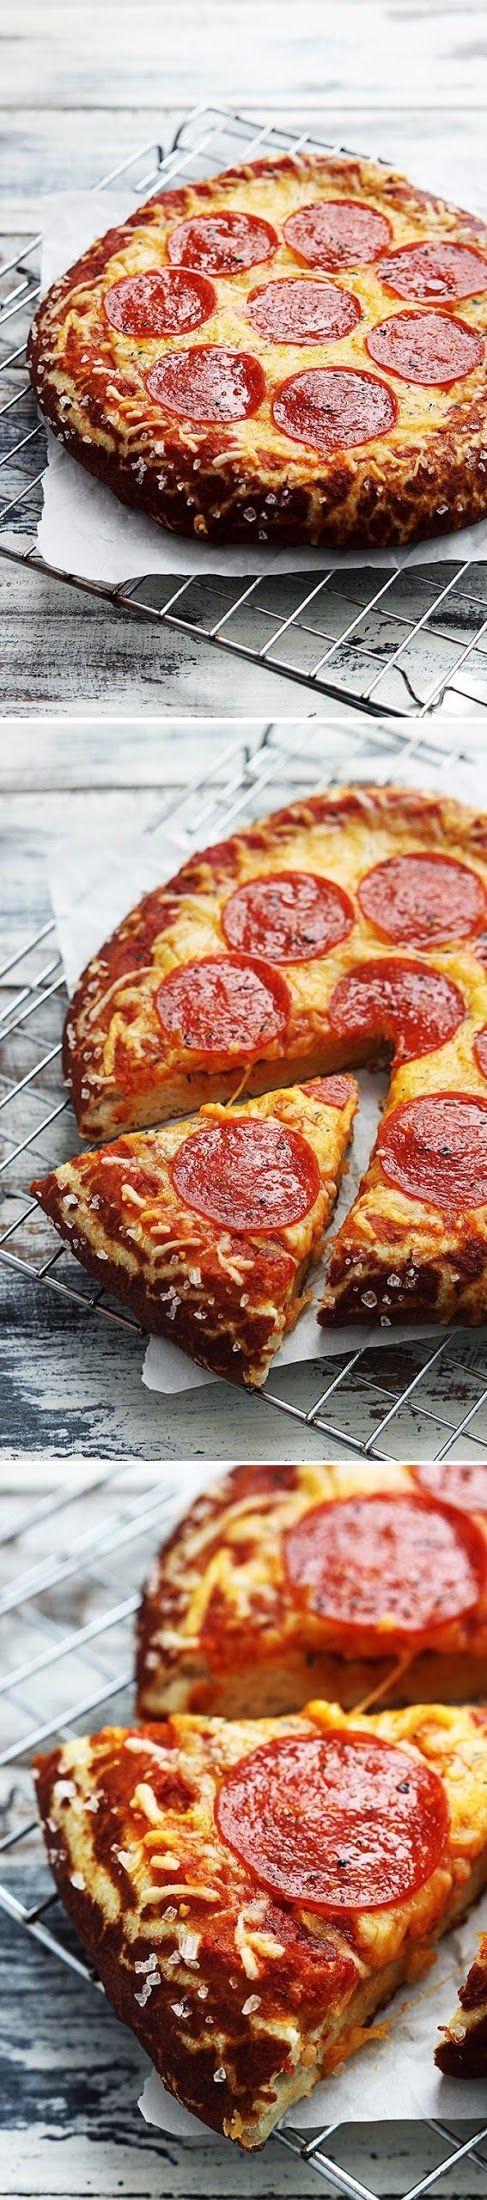 Pretzel crust pizza. .. has to be even better than Little Caesars!